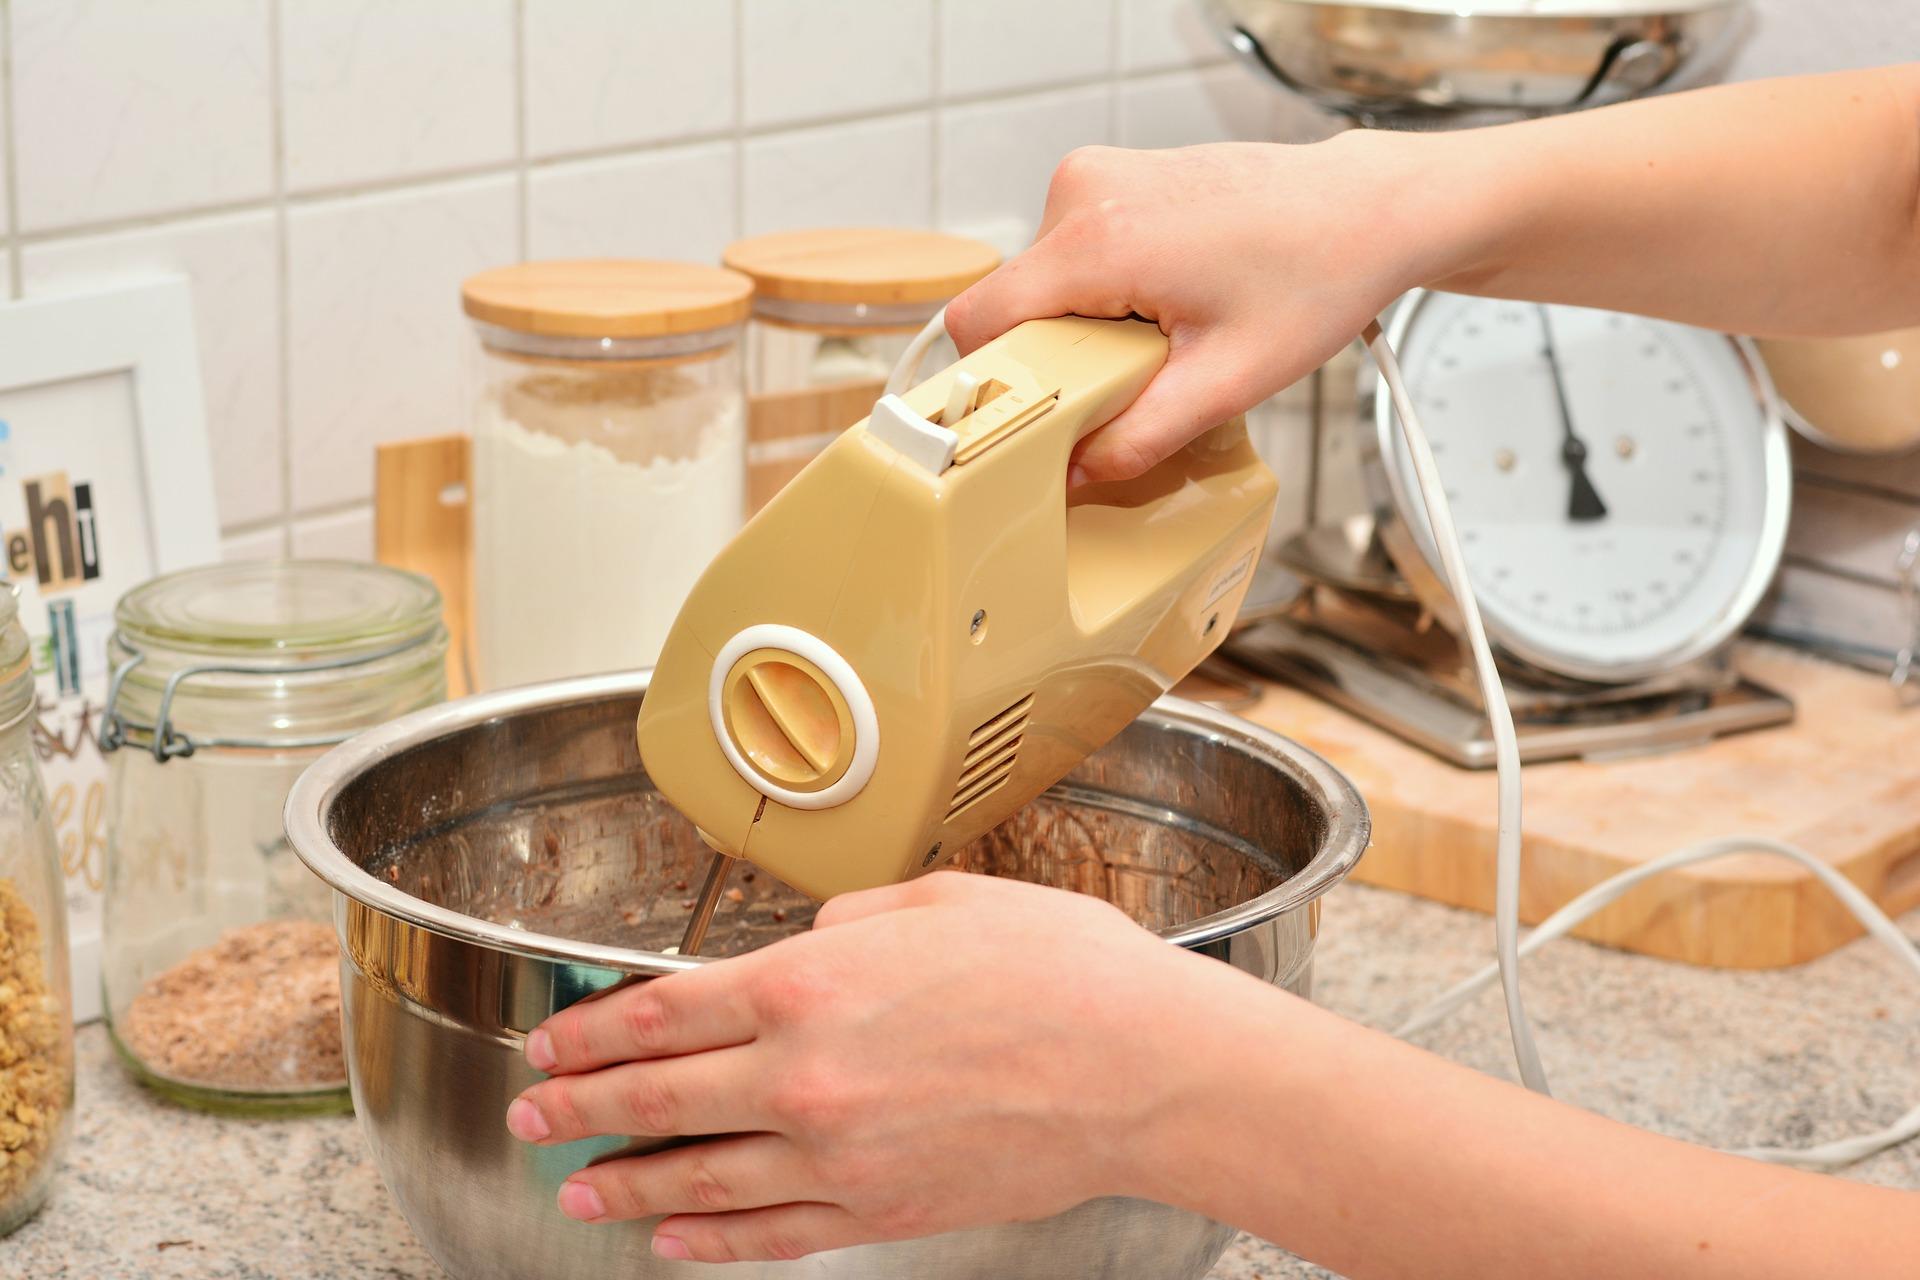 batidora de cocina